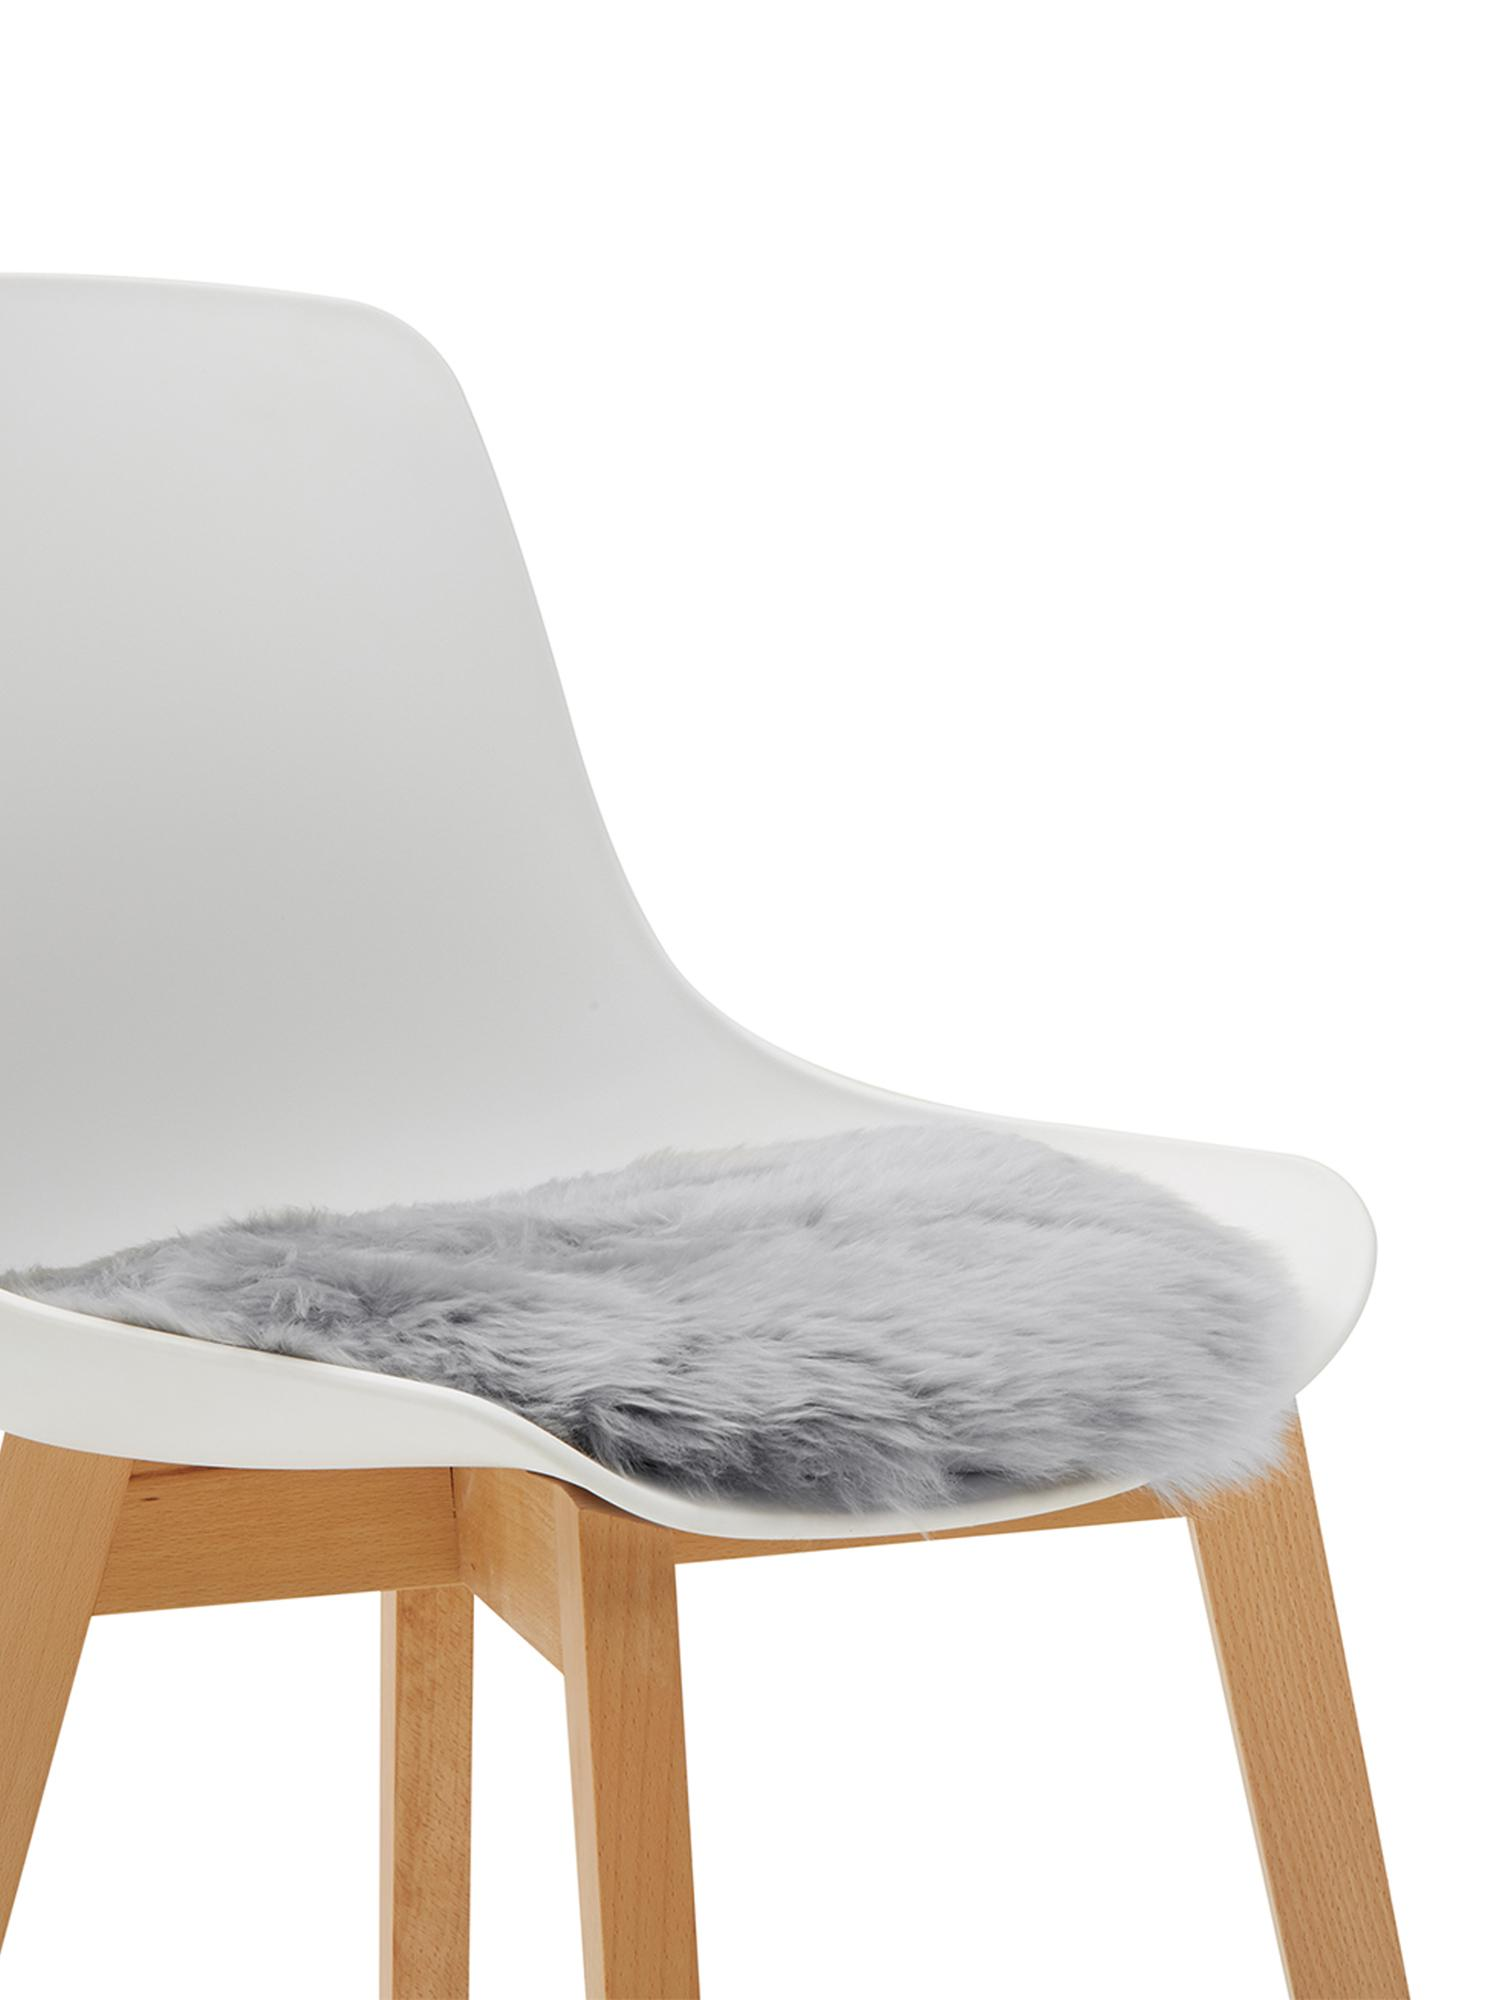 Runde Schaffell-Sitzauflage Oslo, glatt, Flor: 100% Schaffell, Rückseite: 100% Polyester, Hellgrau, Ø 37 cm